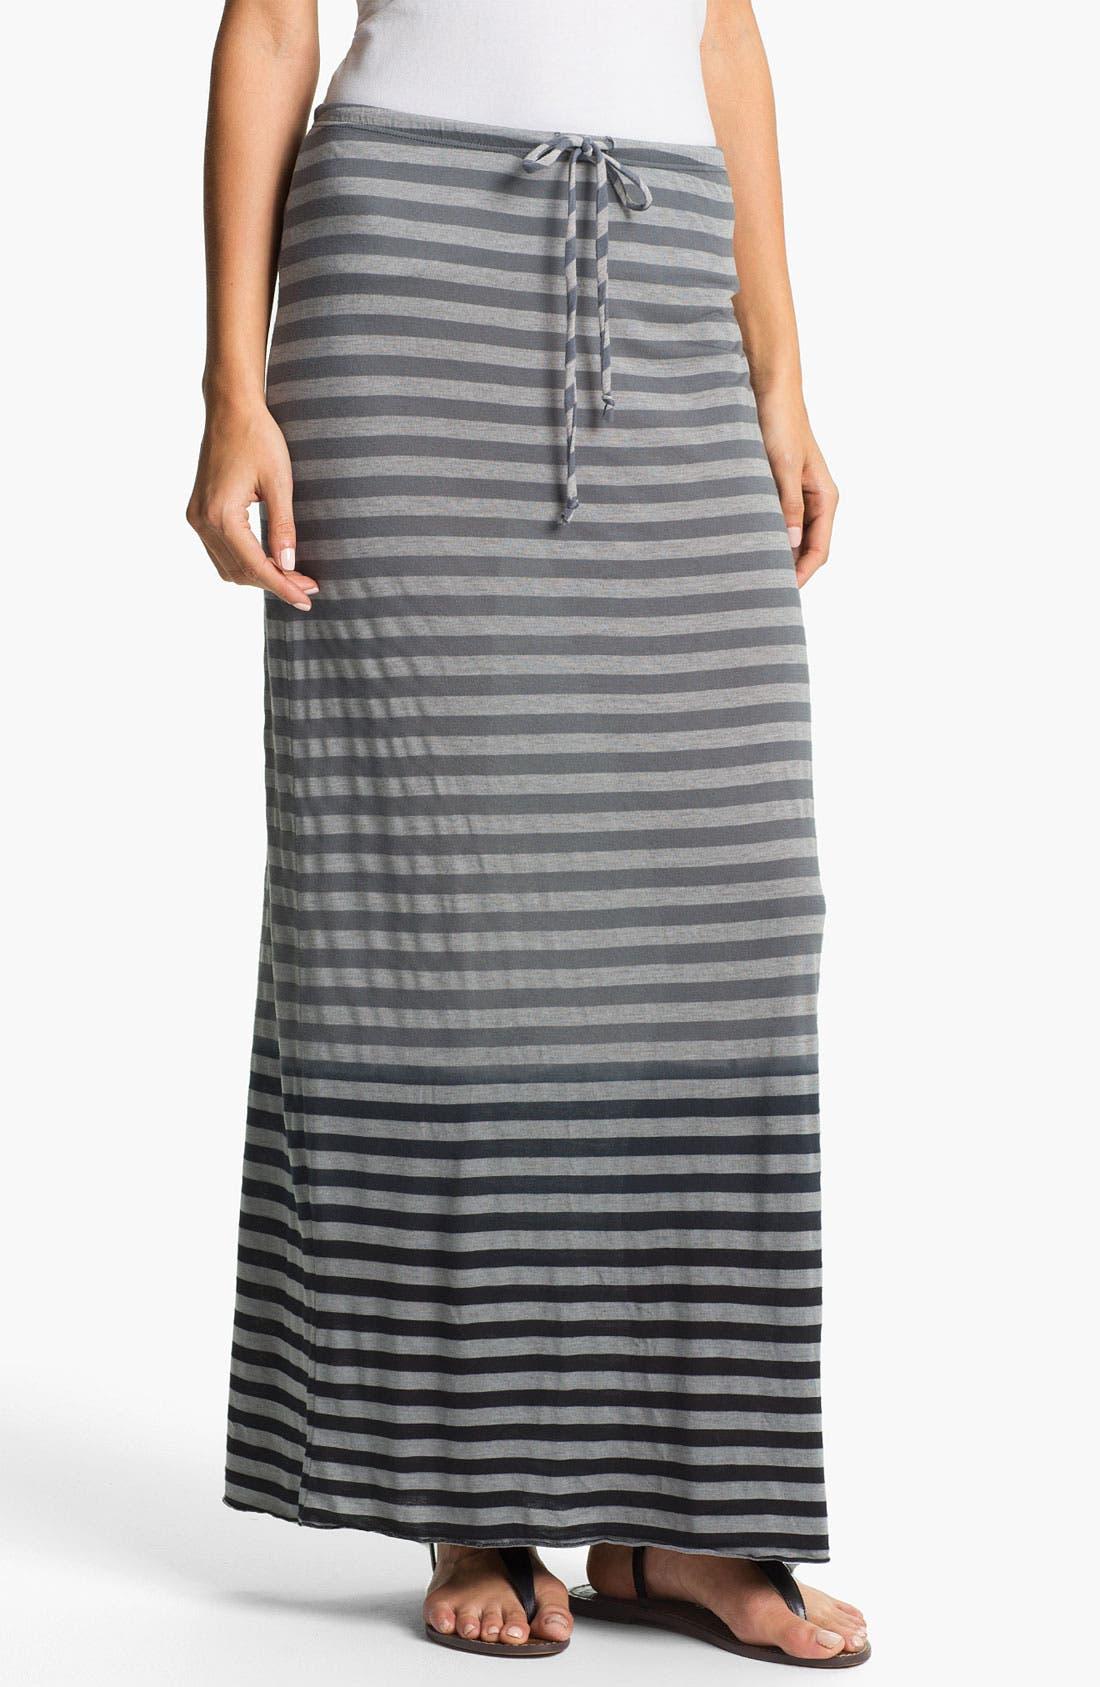 Alternate Image 1 Selected - Allen Allen Ombré Stripe Maxi Skirt